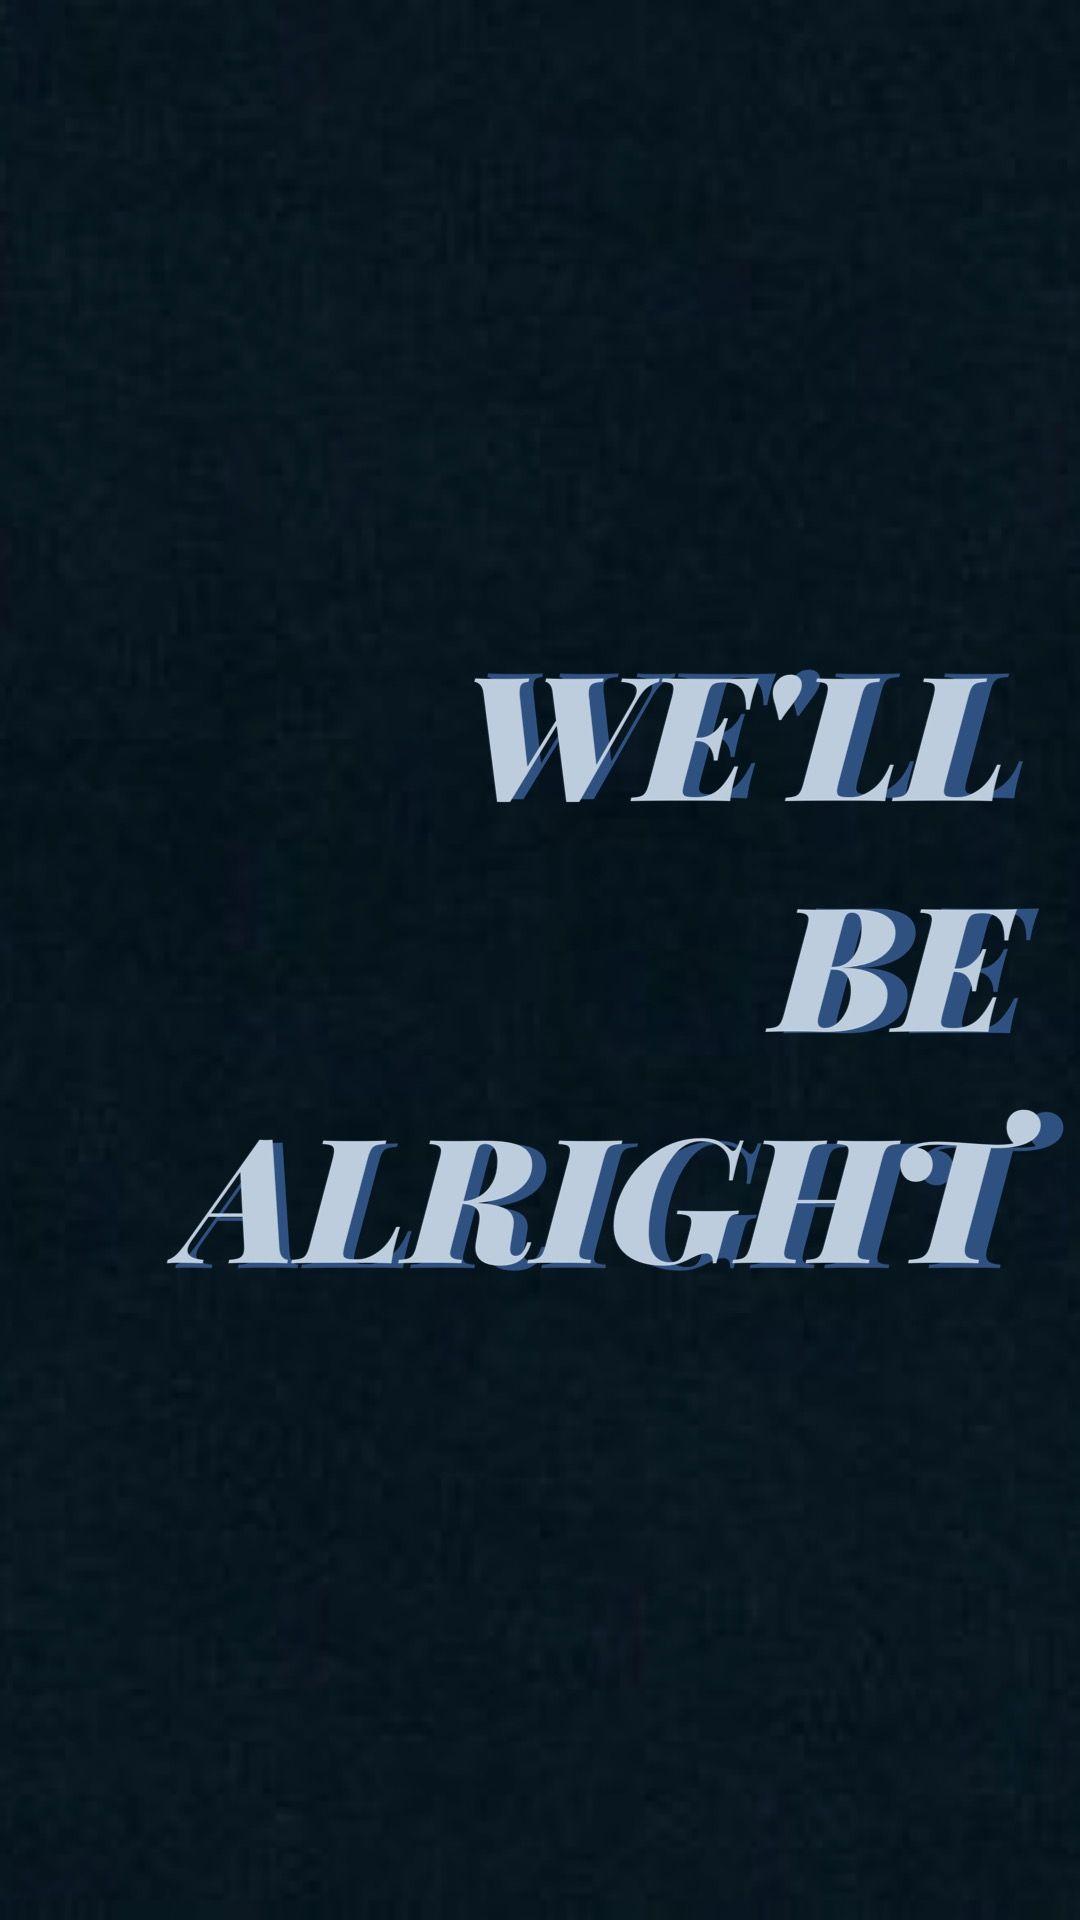 Harry Styles Lock Screen In 2020 Style Lyrics Harry Styles Quotes Lyrics Aesthetic